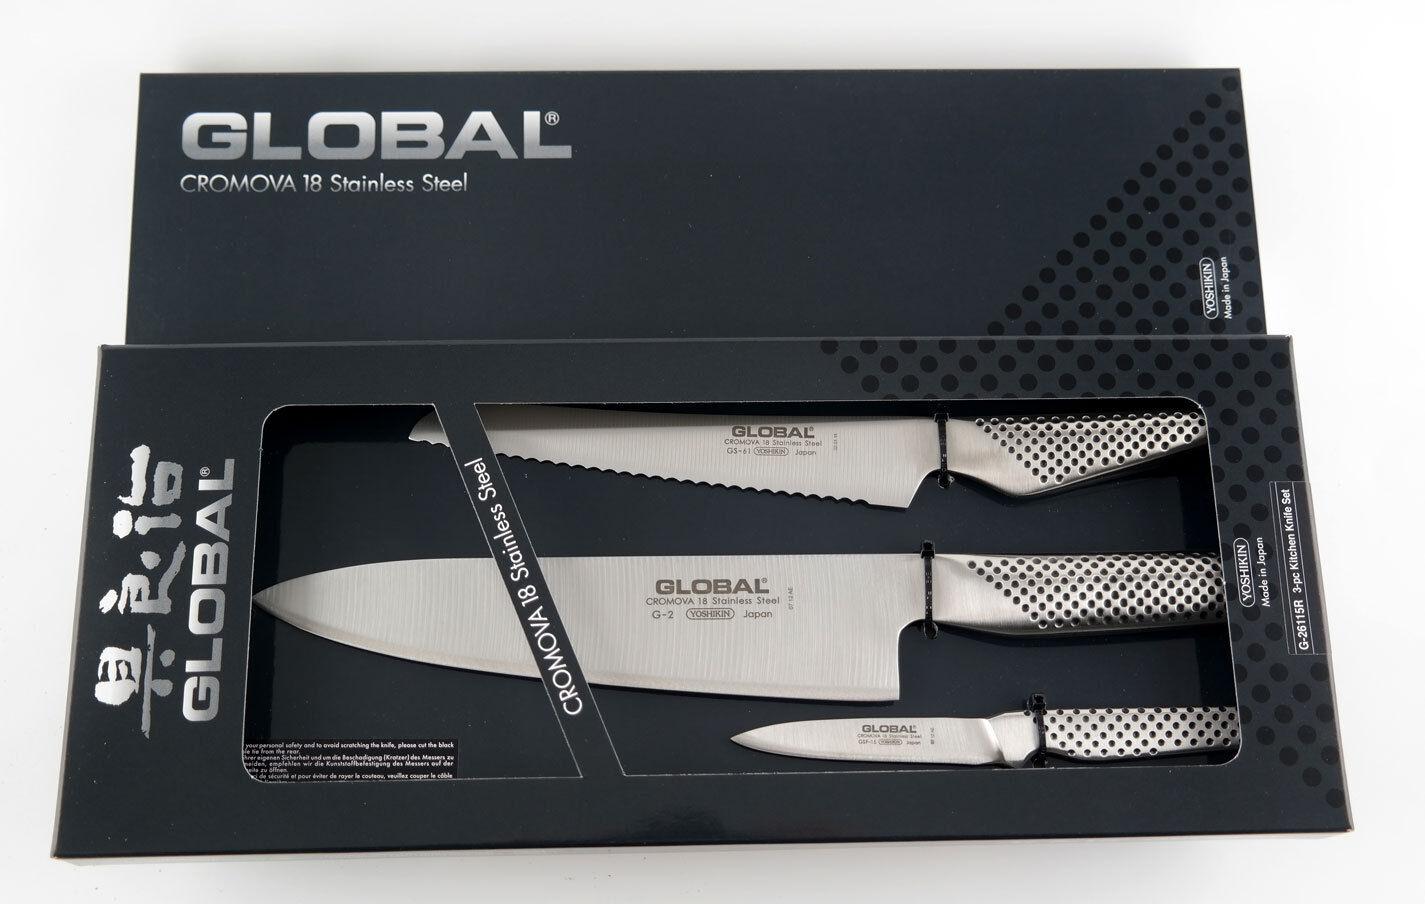 GLOBAL Kochmesser    3er Set - 20cm 16cm 8cm Klinge in Geschenkbox G-26115R     | Haltbar  6c39e4